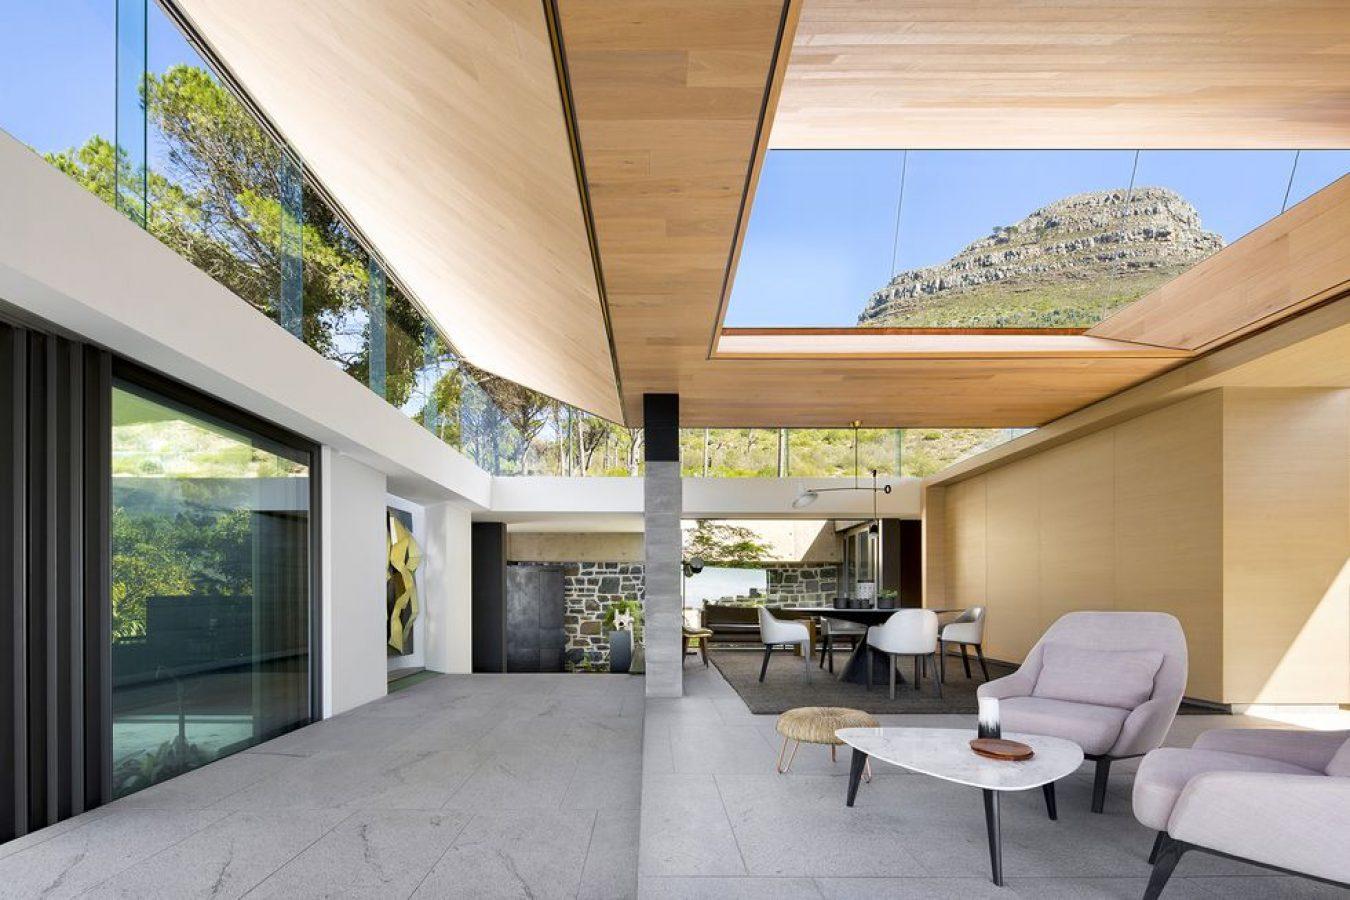 Casa abierta a la Naturaleza